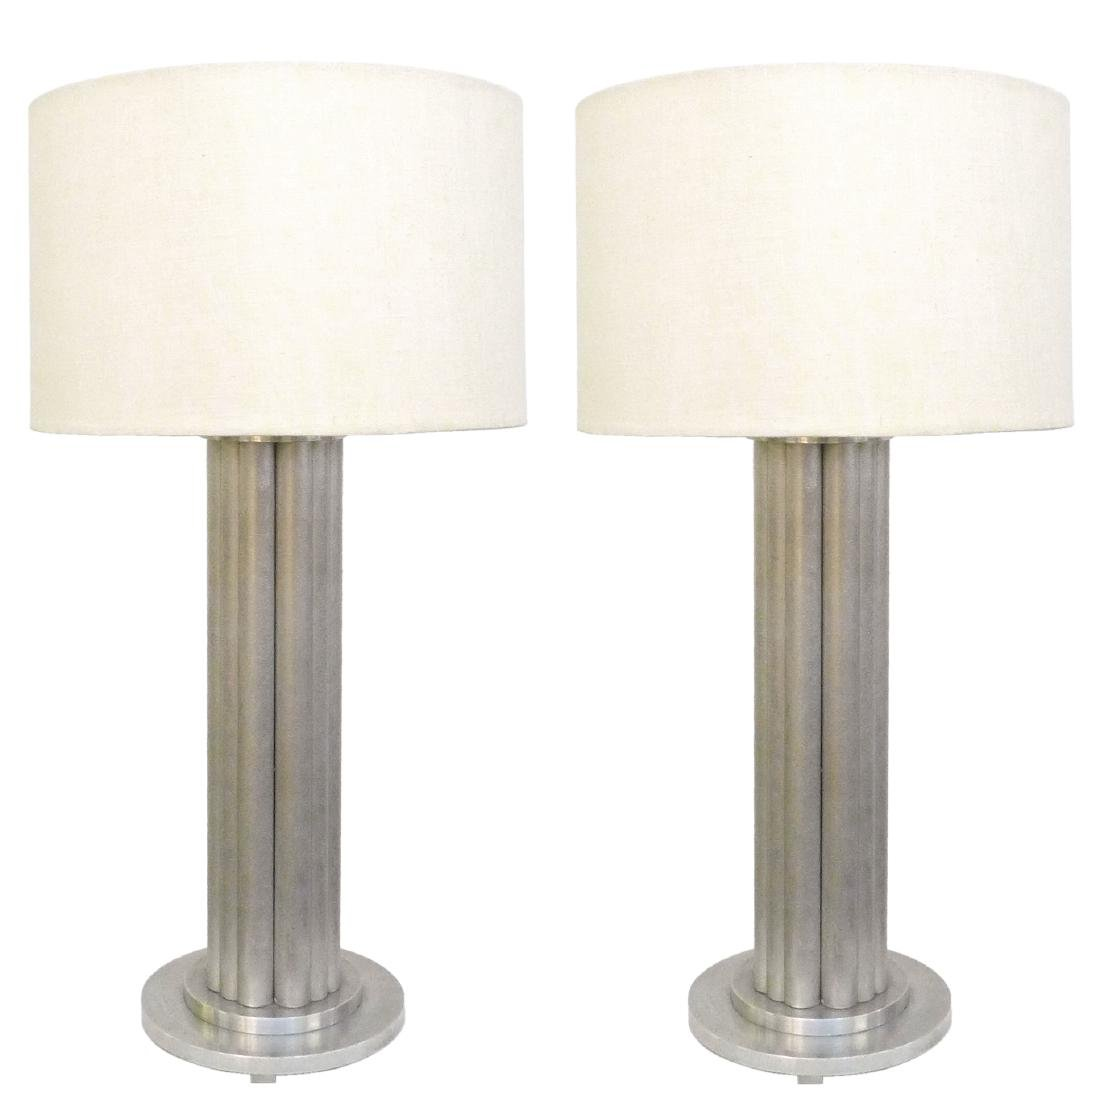 Art Deco Table Lamps (2)